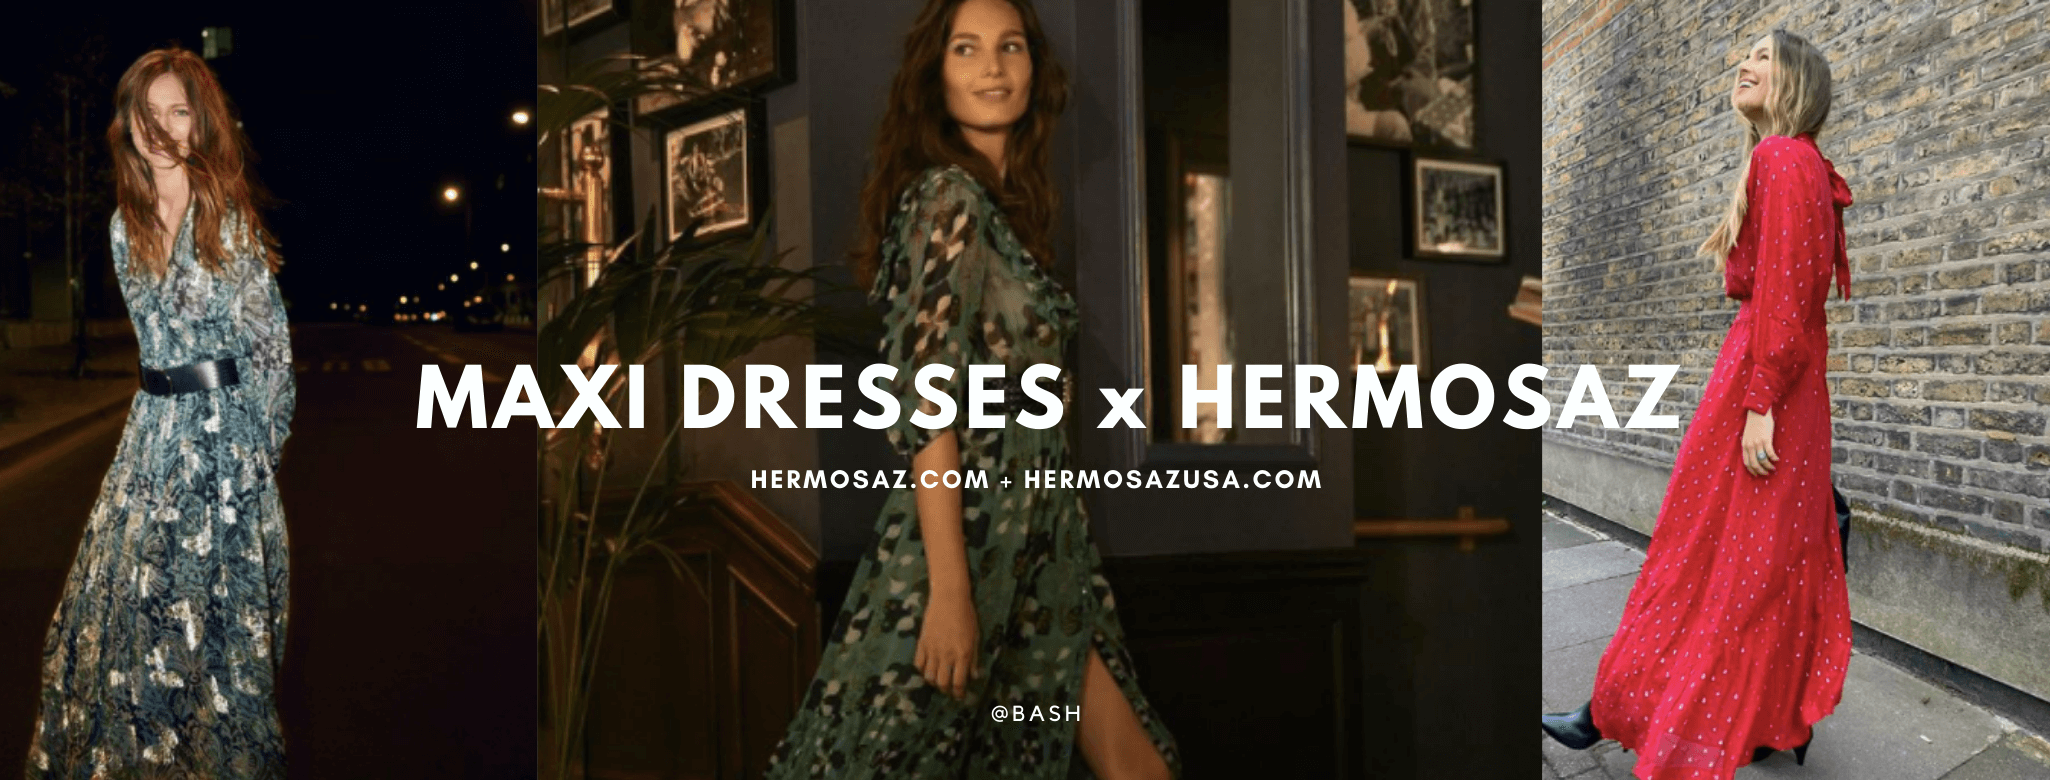 Maxi dress x Hermosaz